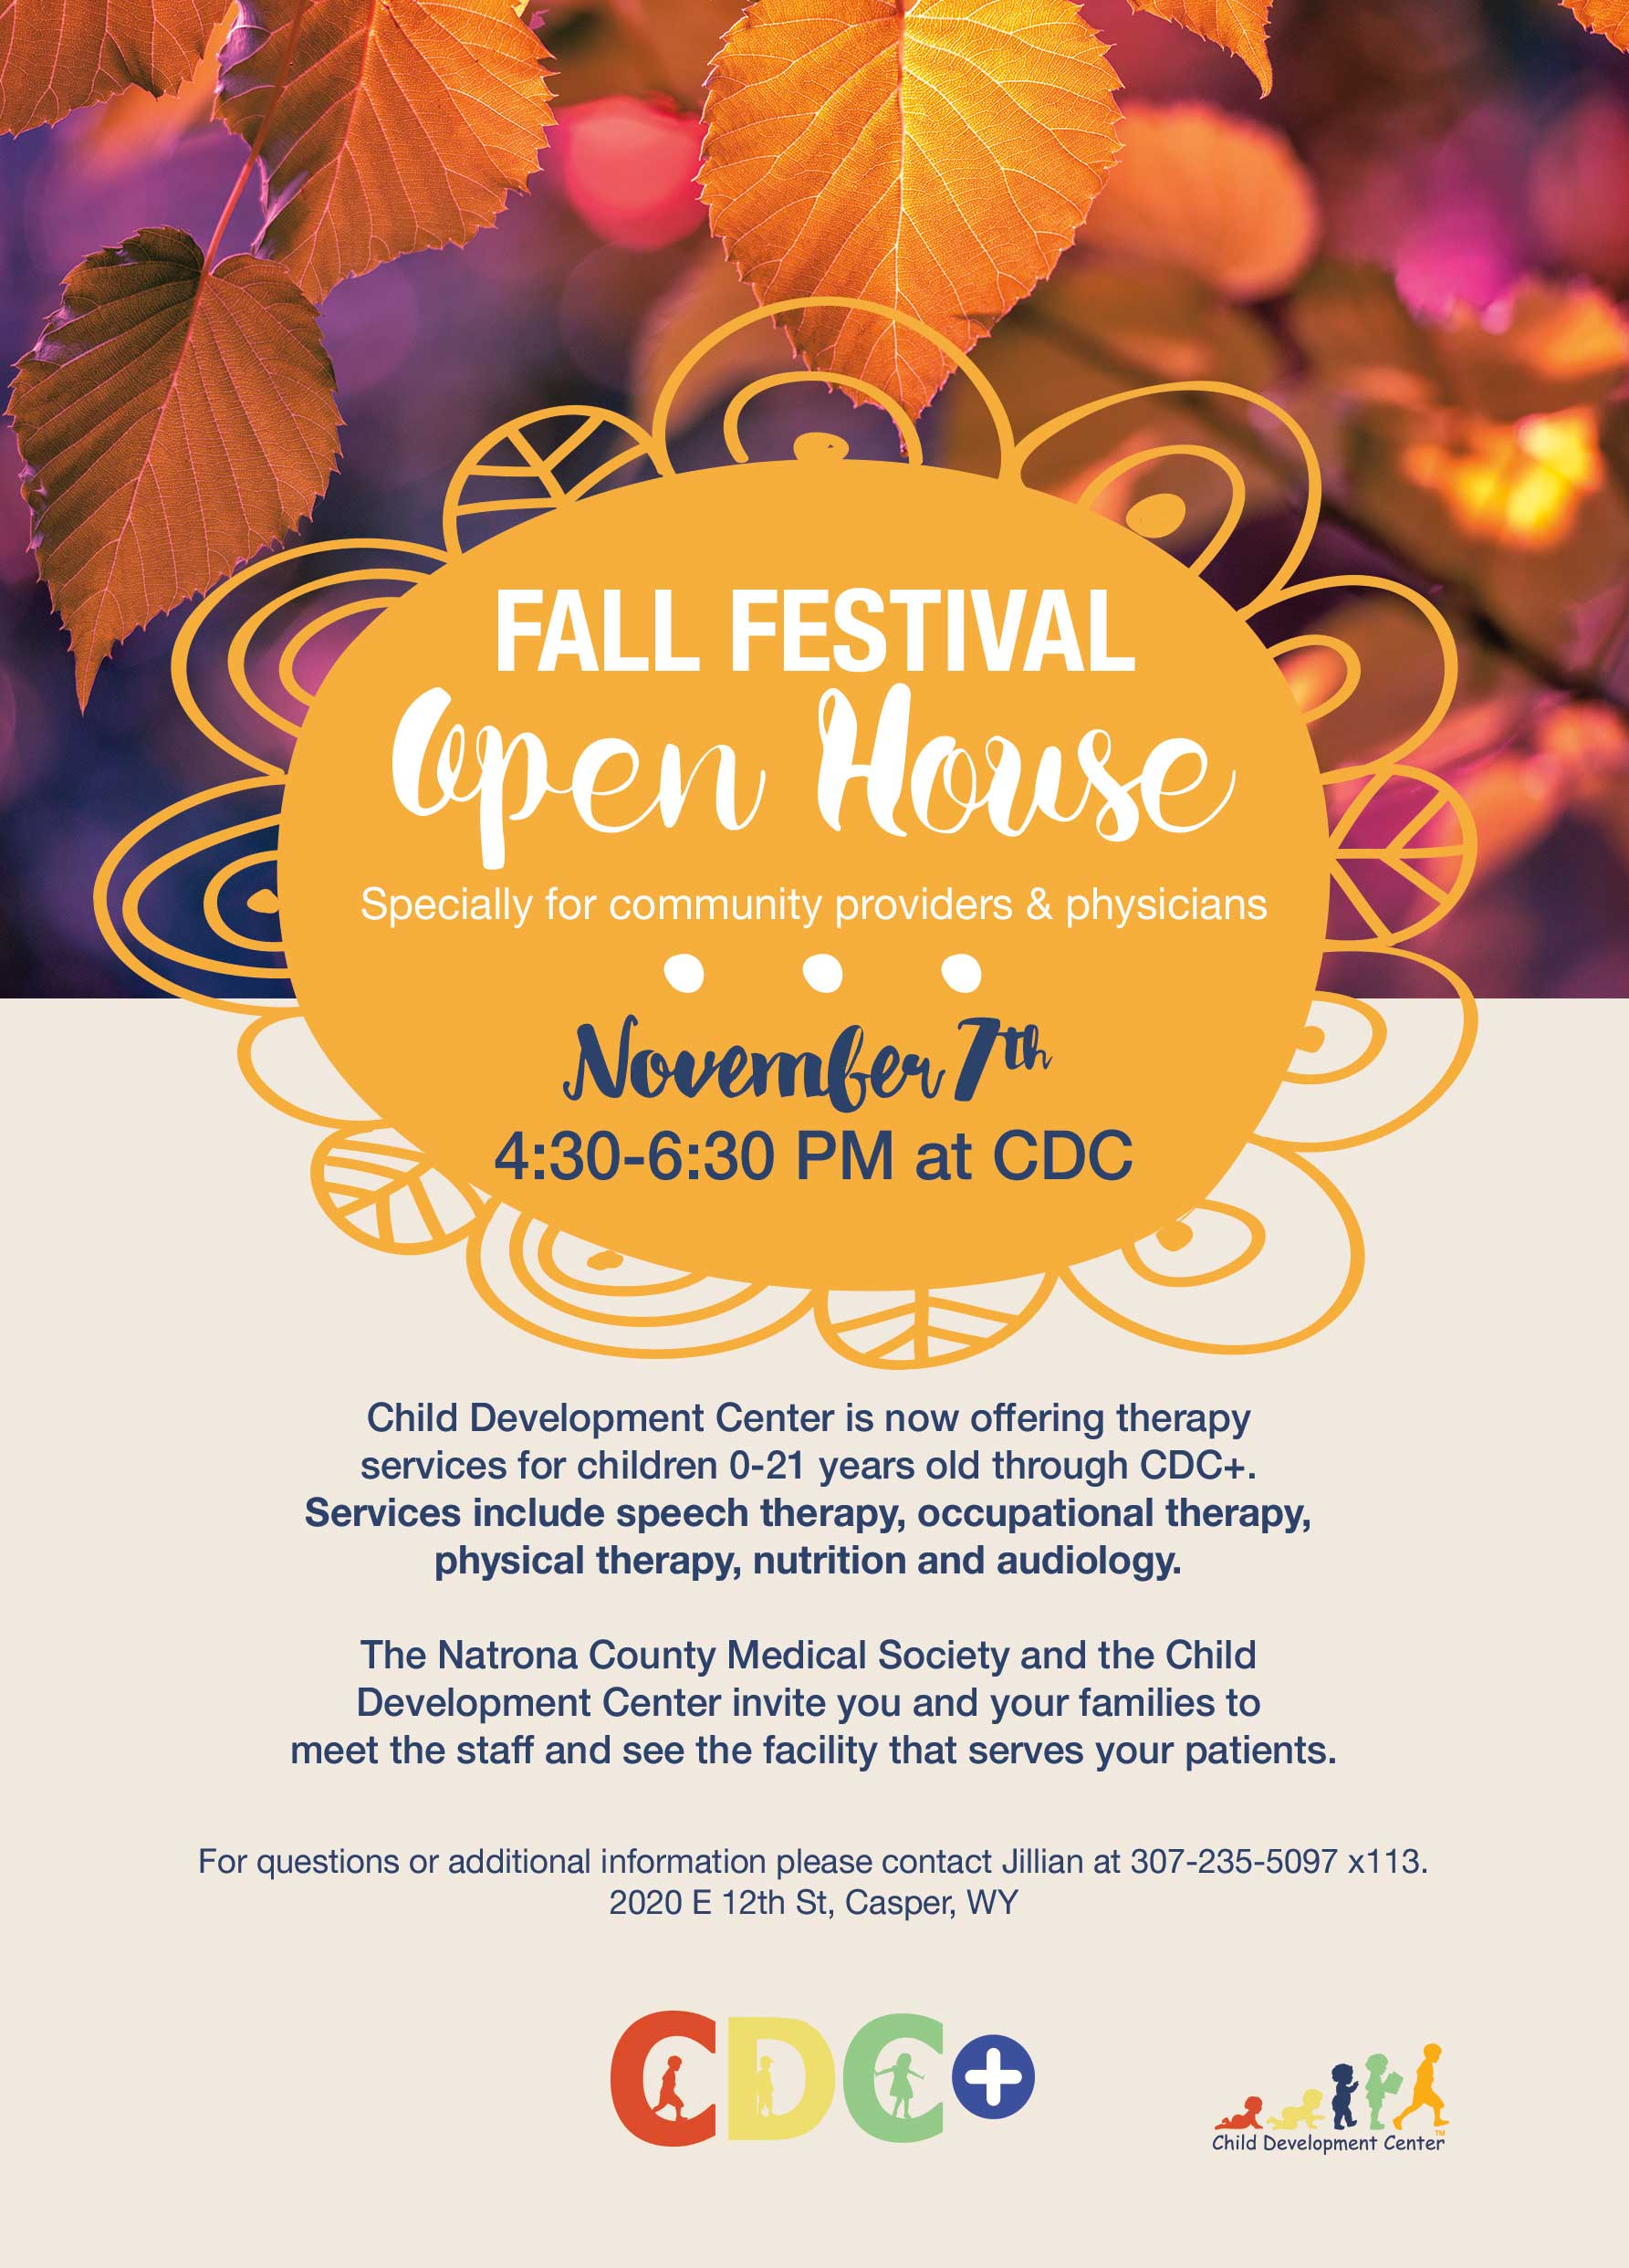 NOV. 7th – Fall Festival Open House